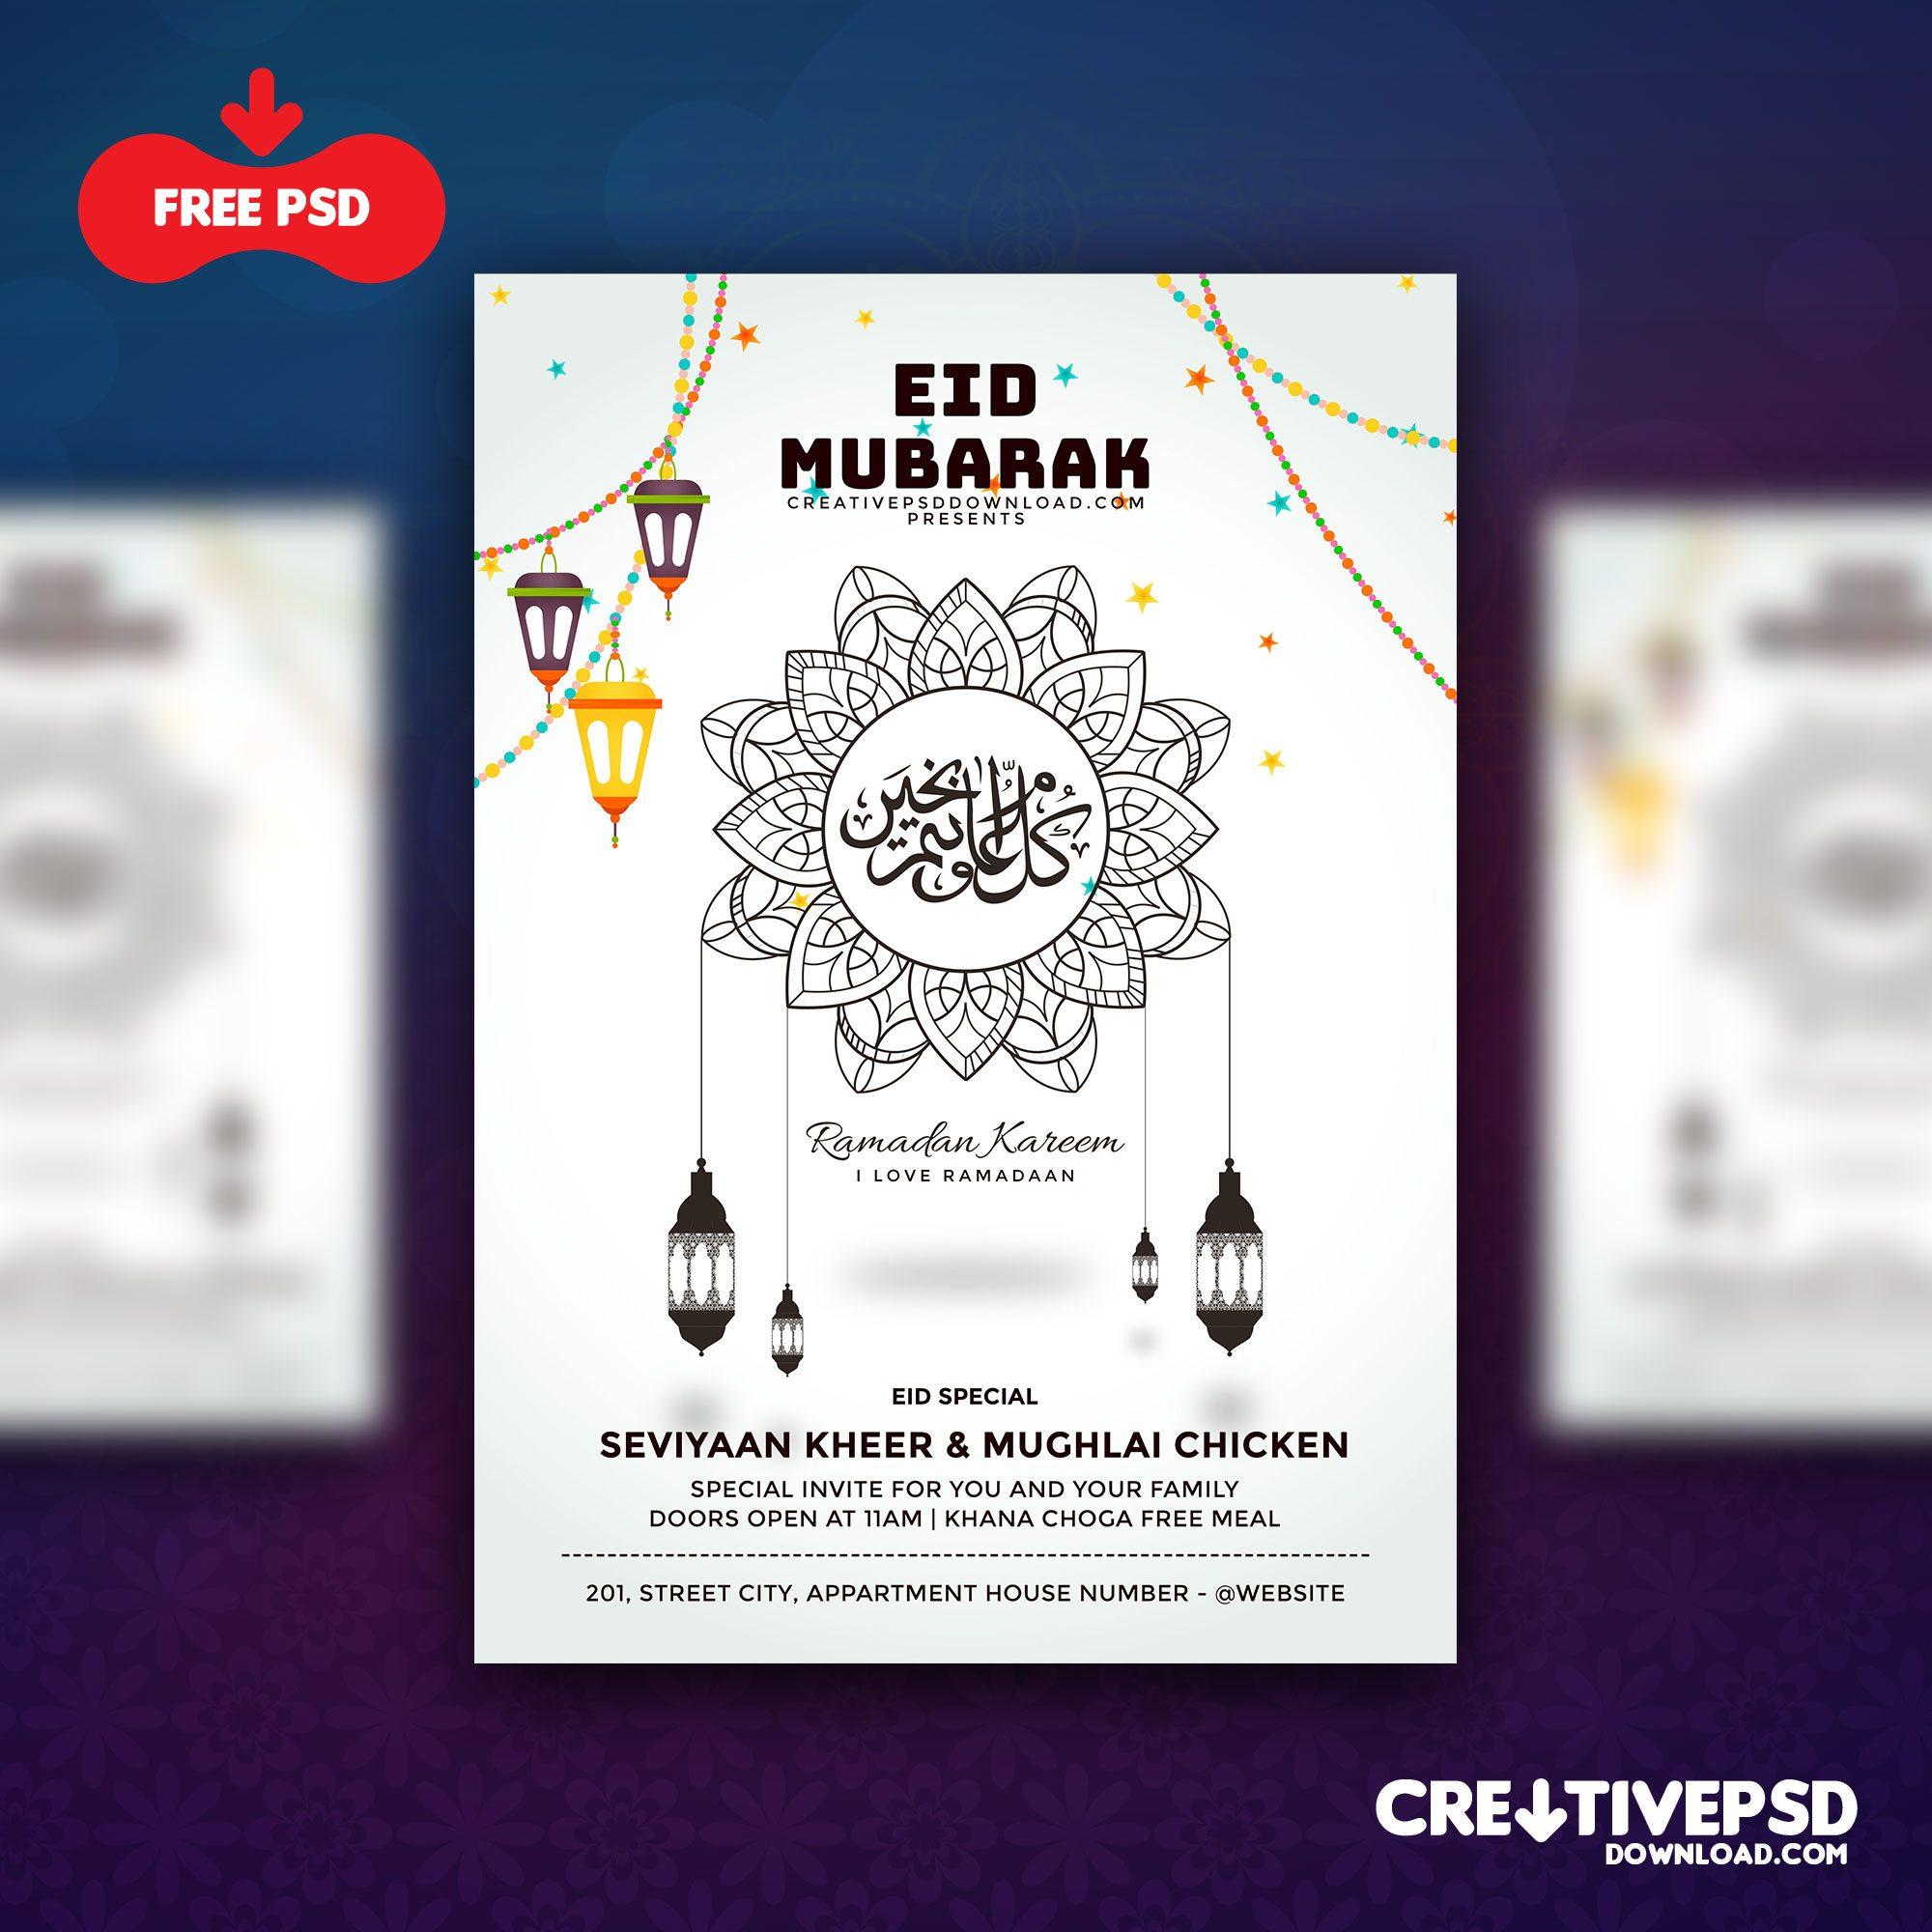 Eid Mubarak Invite Flyer Freebie Psd